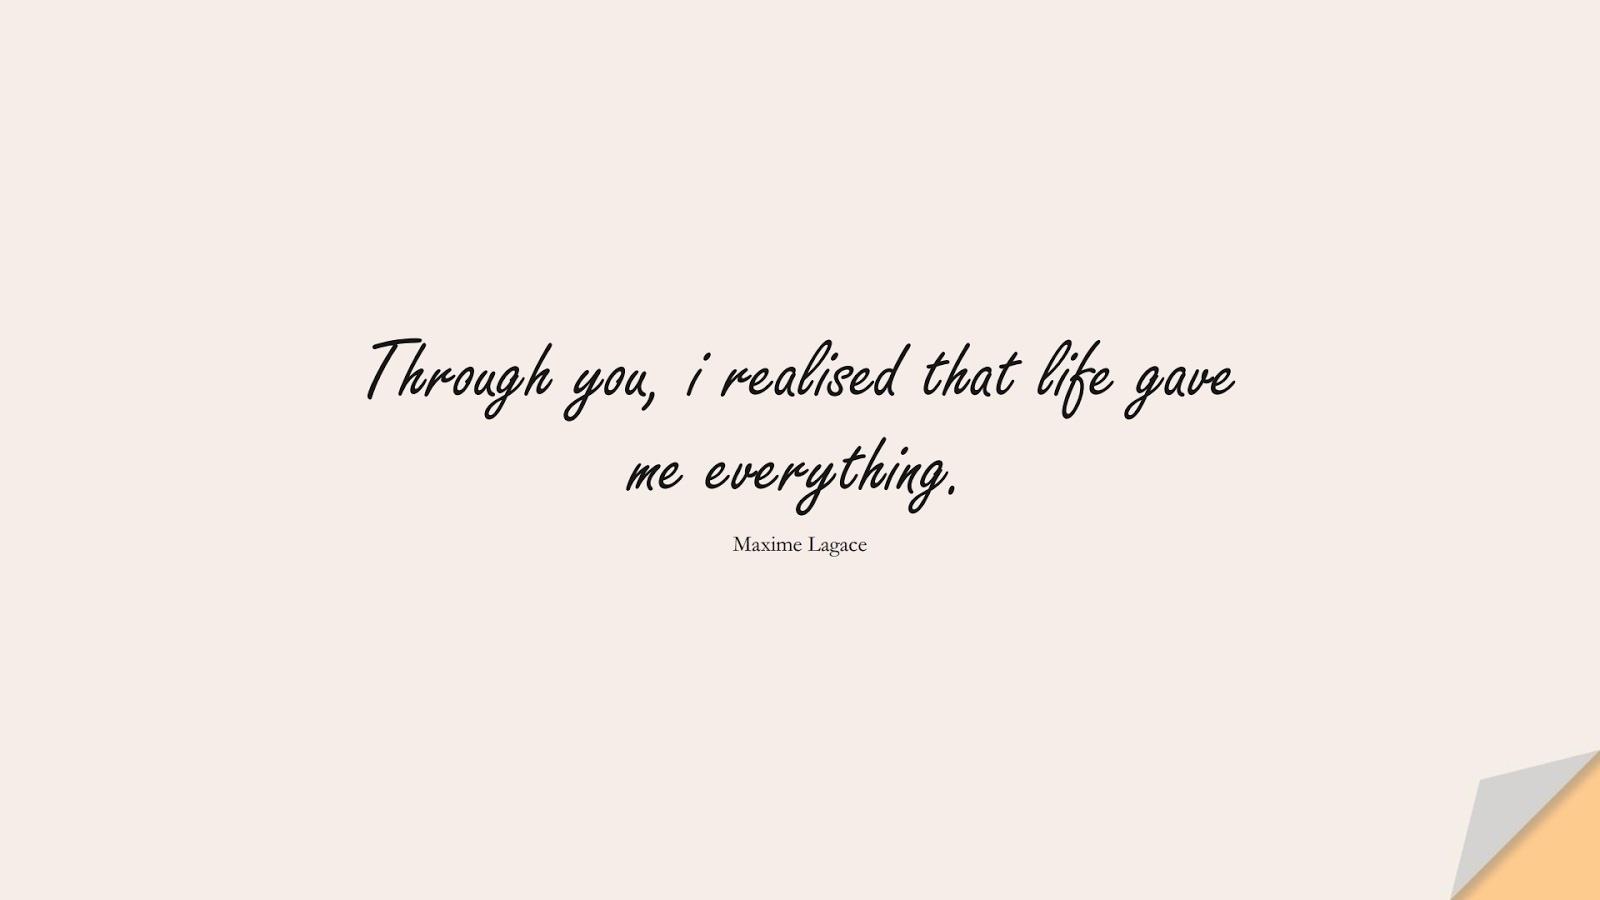 Through you, i realised that life gave me everything. (Maxime Lagace);  #LoveQuotes